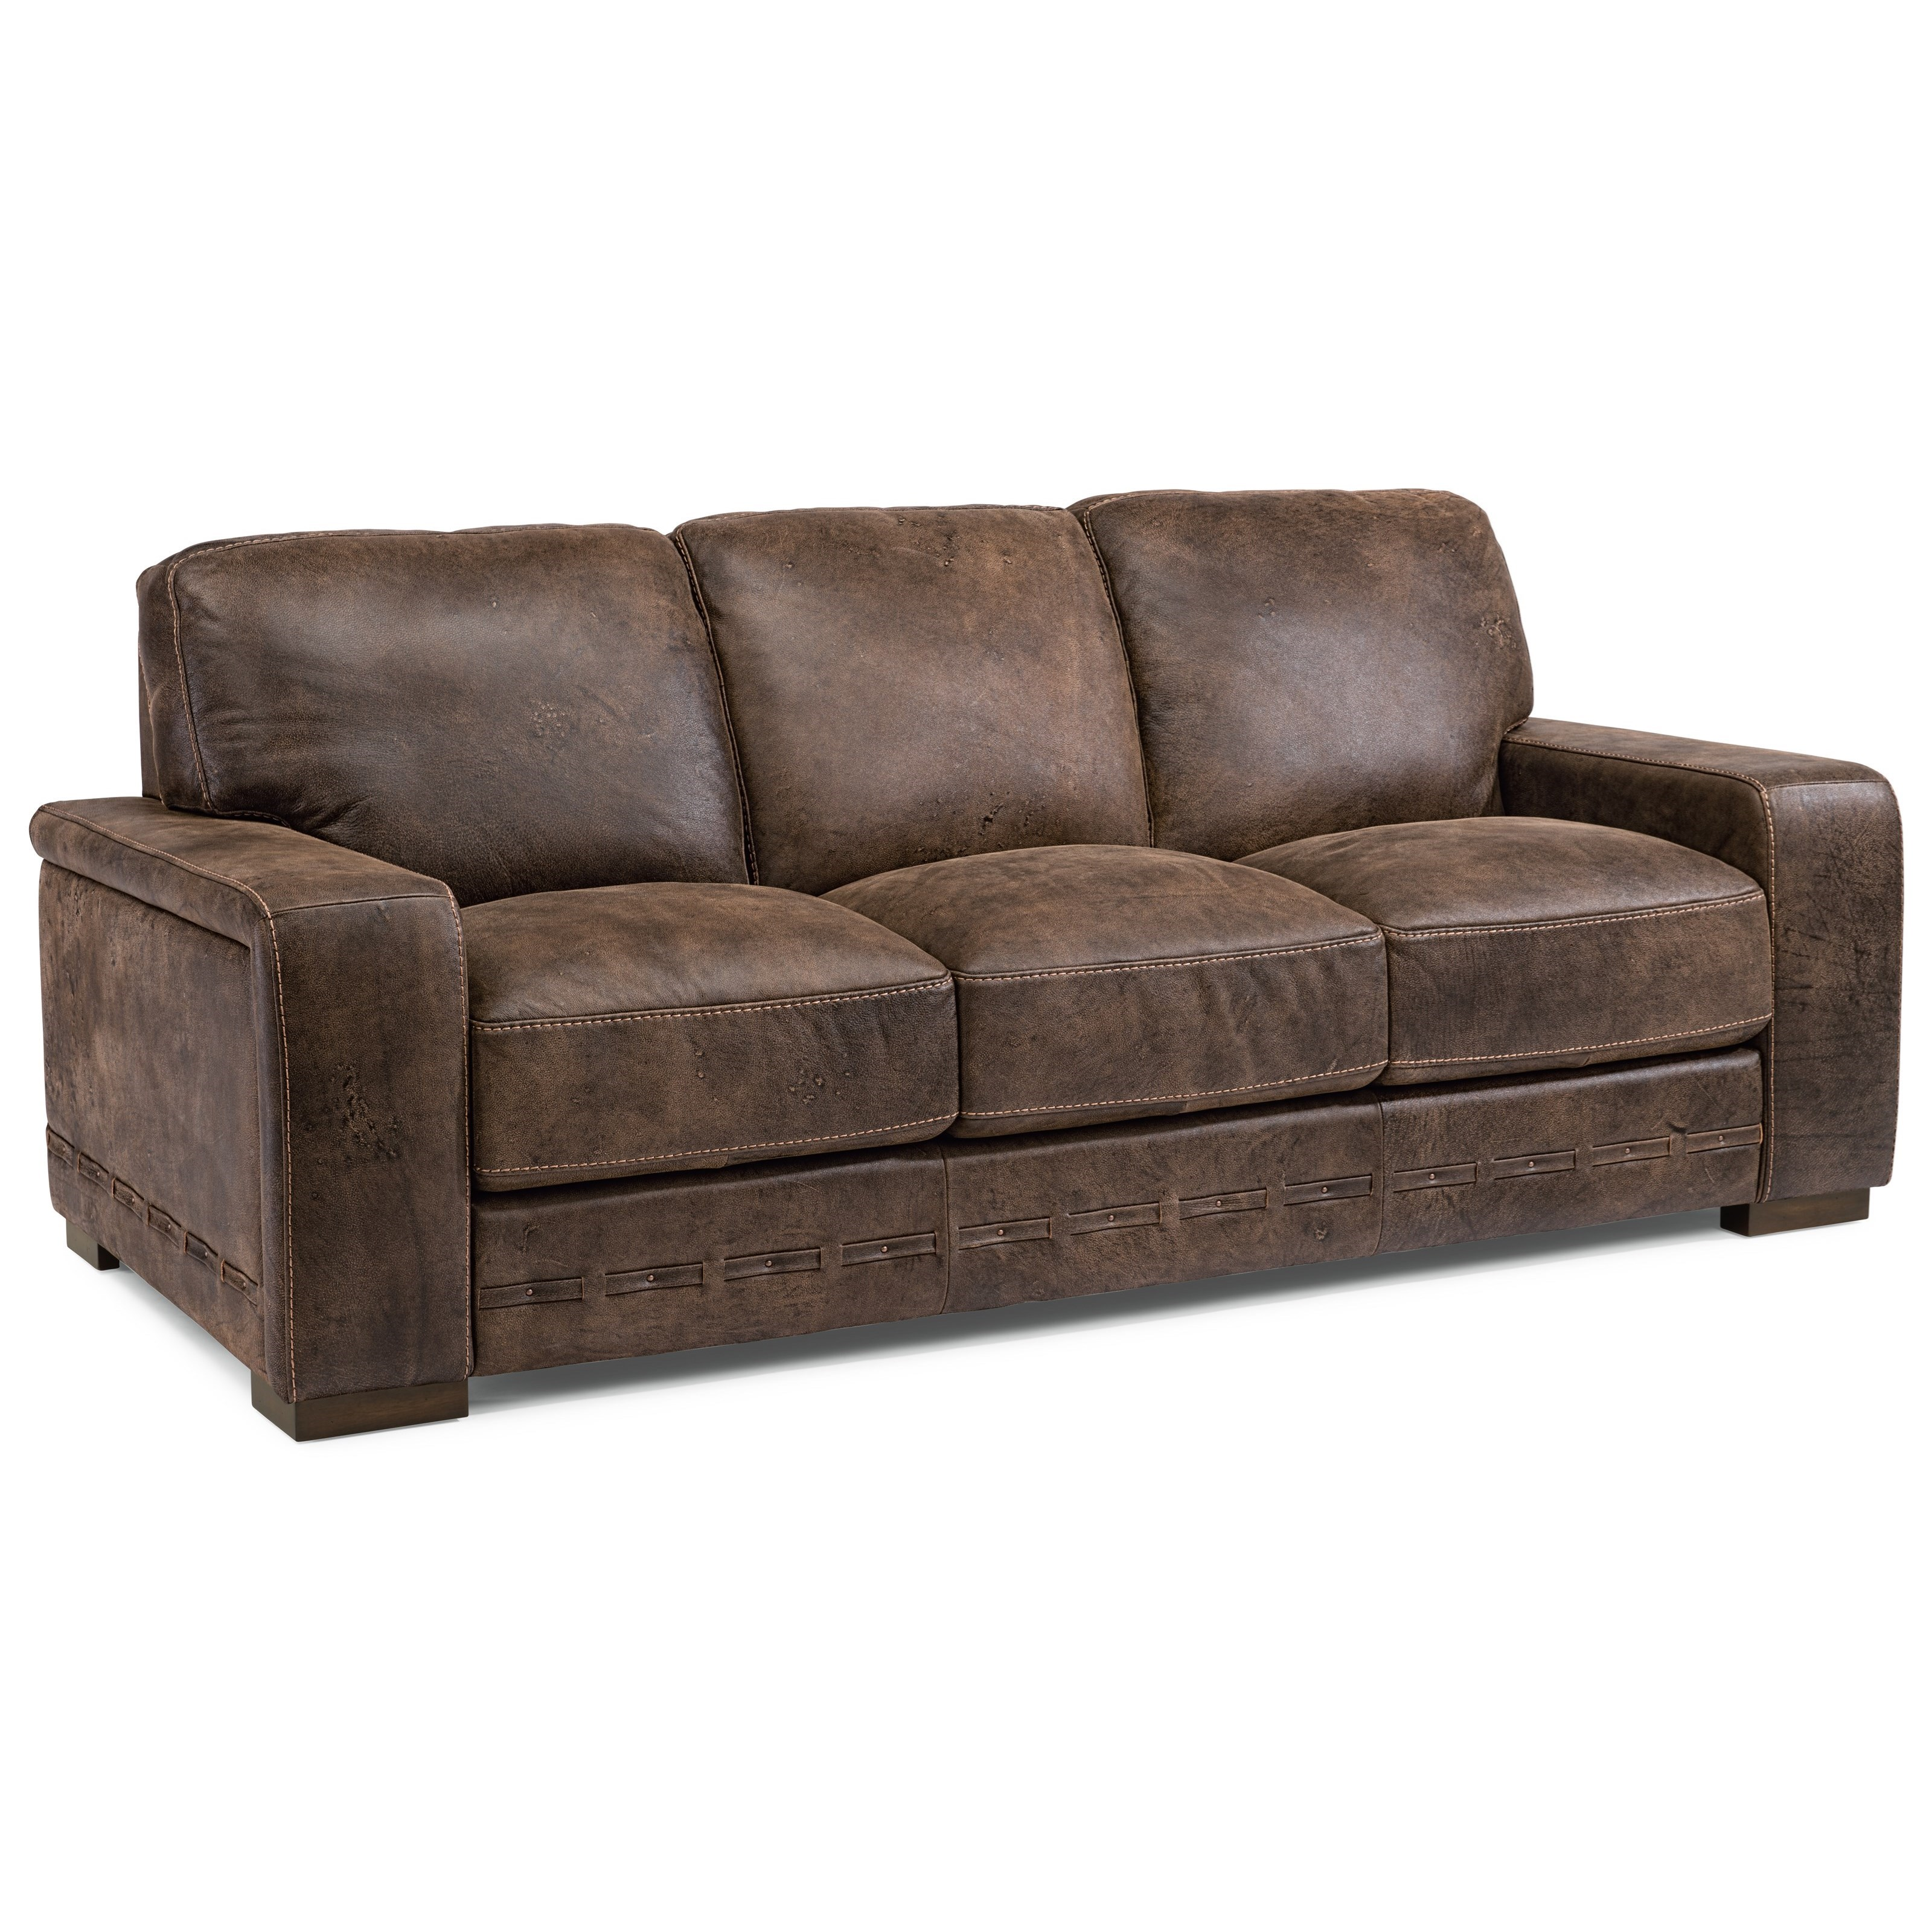 Flexsteel latitudes buxton contemporary leather sofa for Contemporary leather sofa